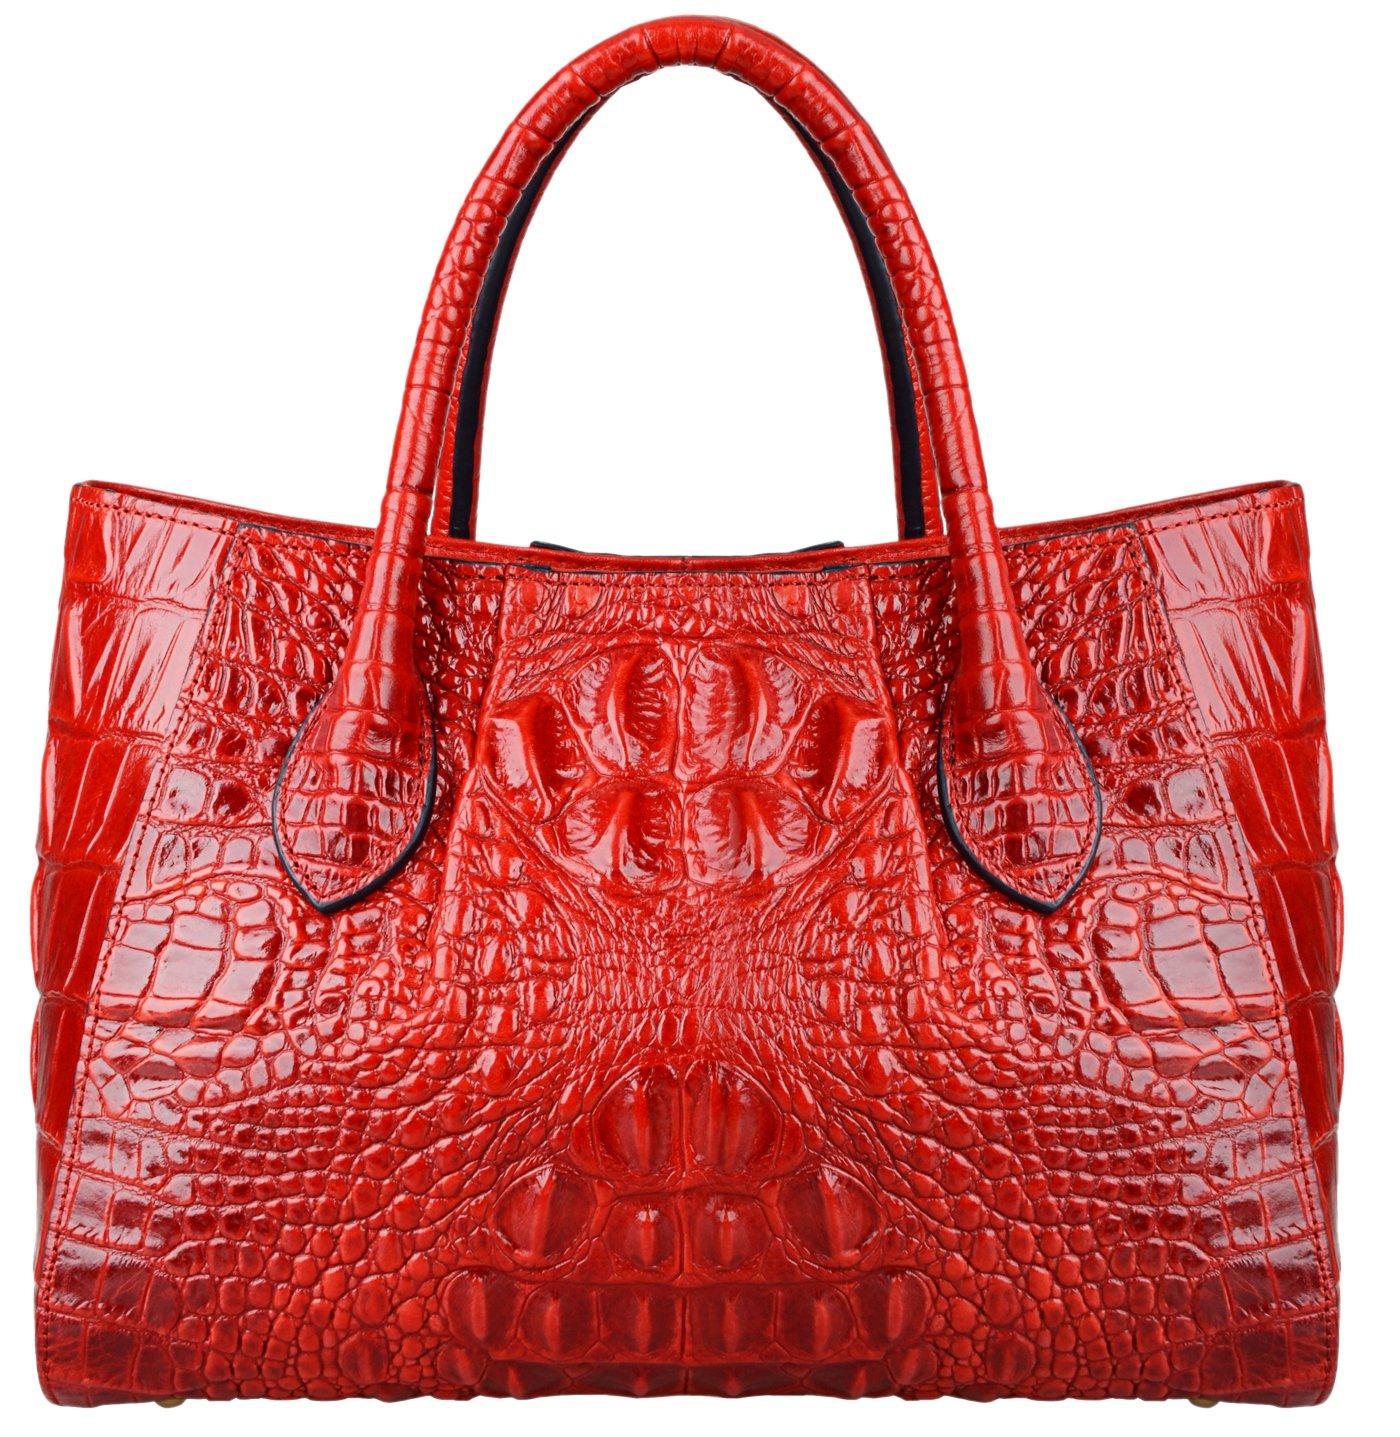 Pijushi Women Embossed Crocodile Bag Designer Top Handle Handbags 5002A (One Size, 5002A Red) by PIJUSHI